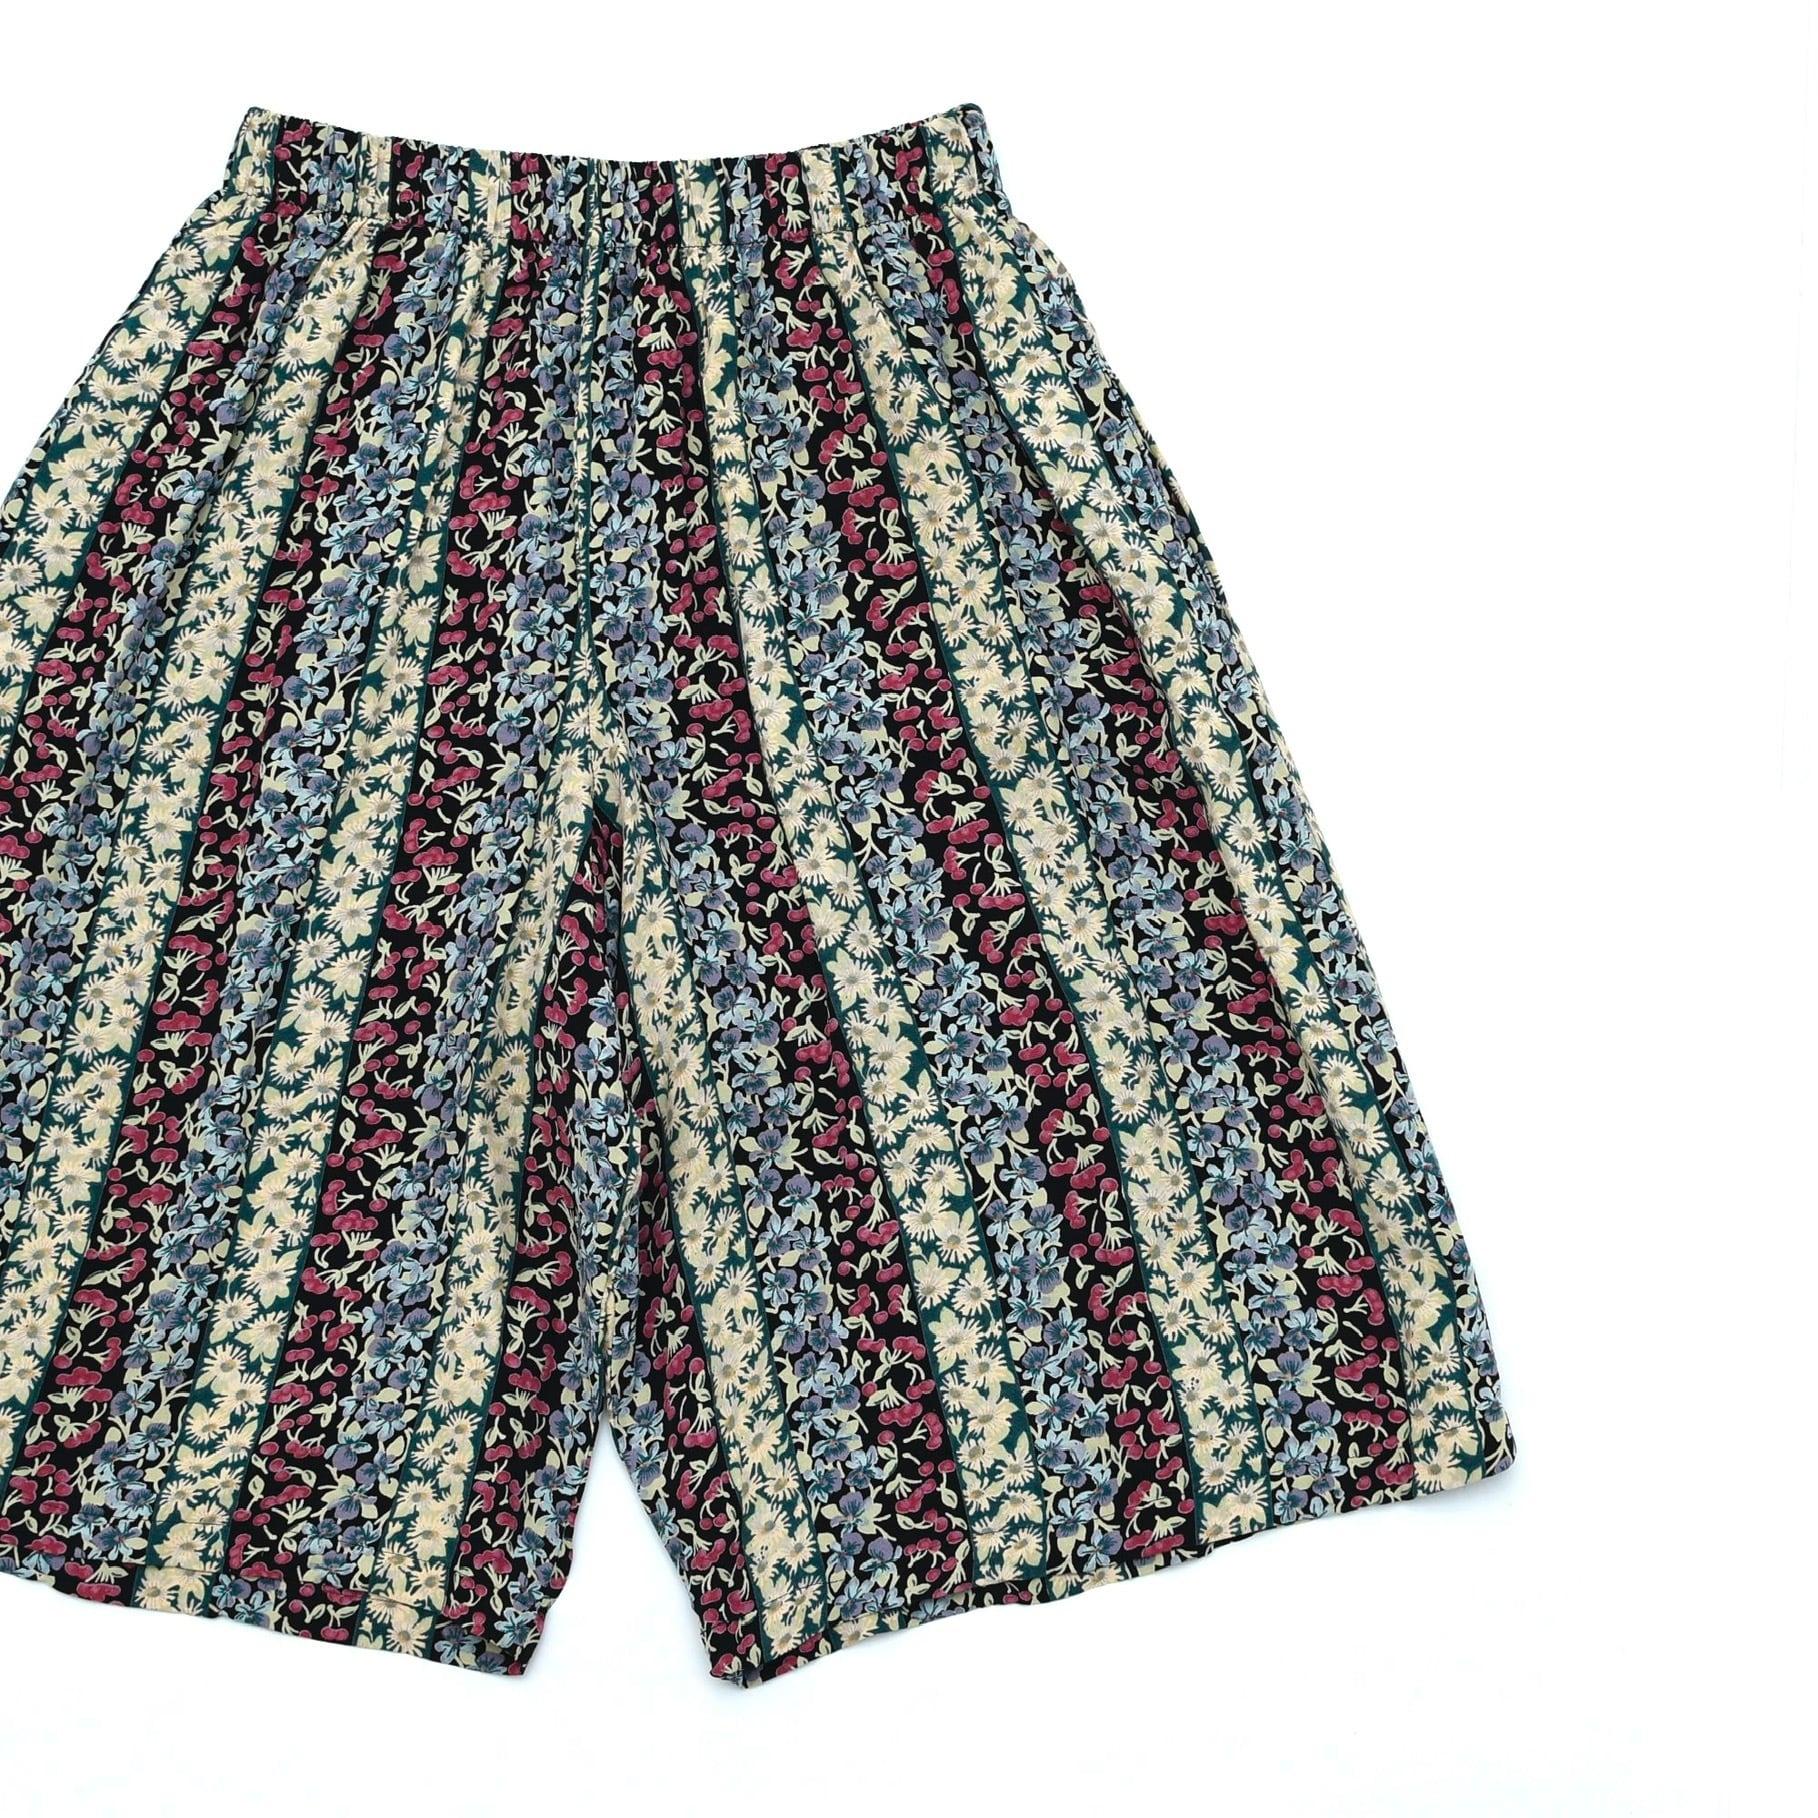 90's m.j.carroll stripe rayon shorts Made in USA